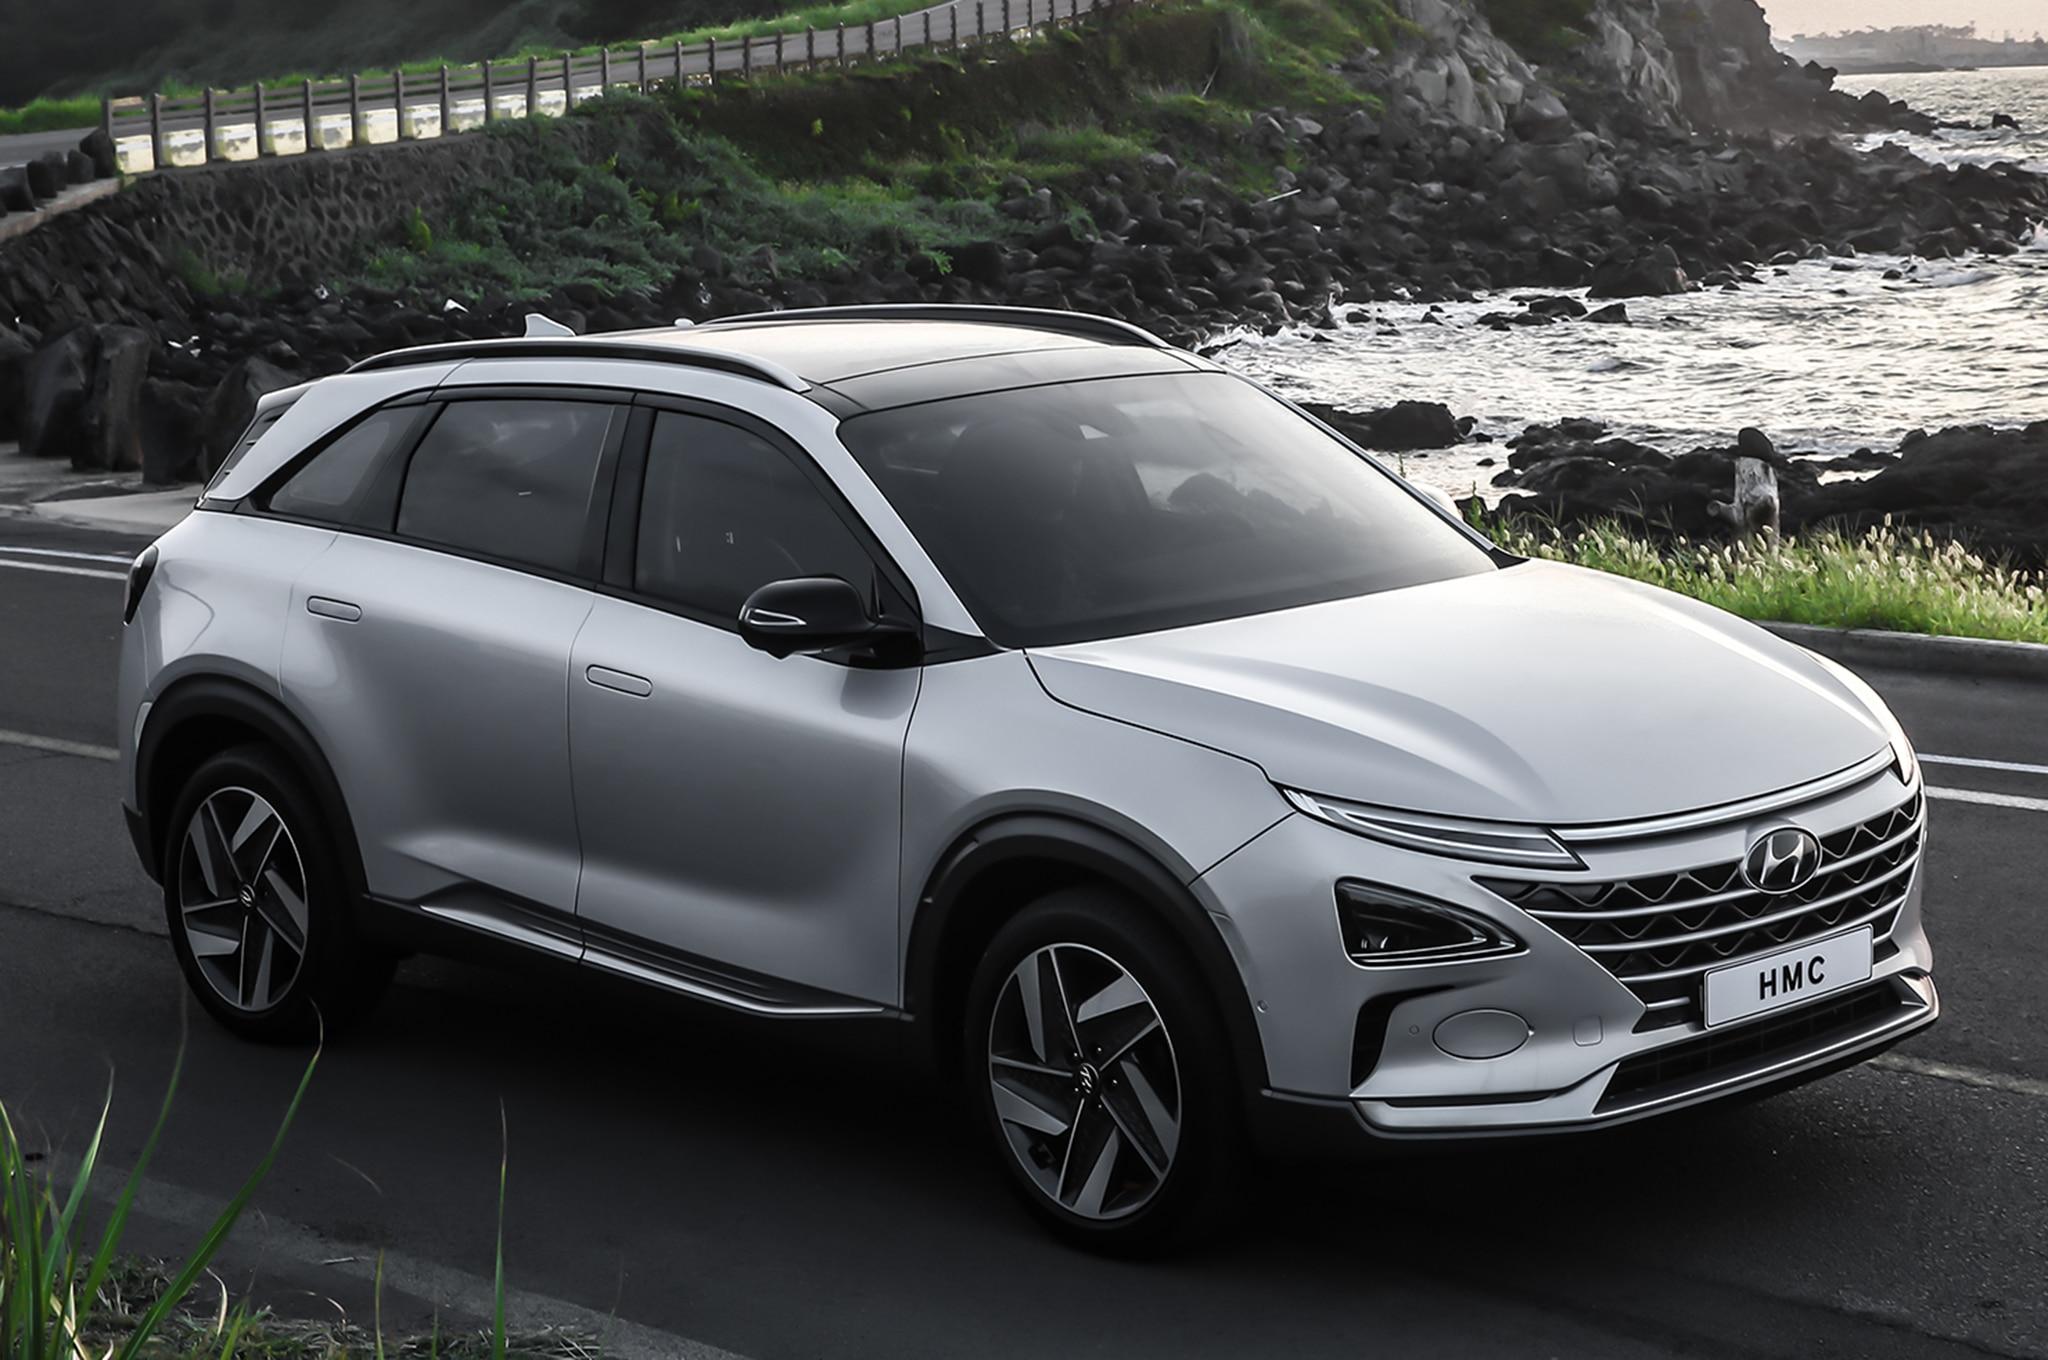 2019 Hyundai Fuel Cell EV SUV Front Three Quarter 03